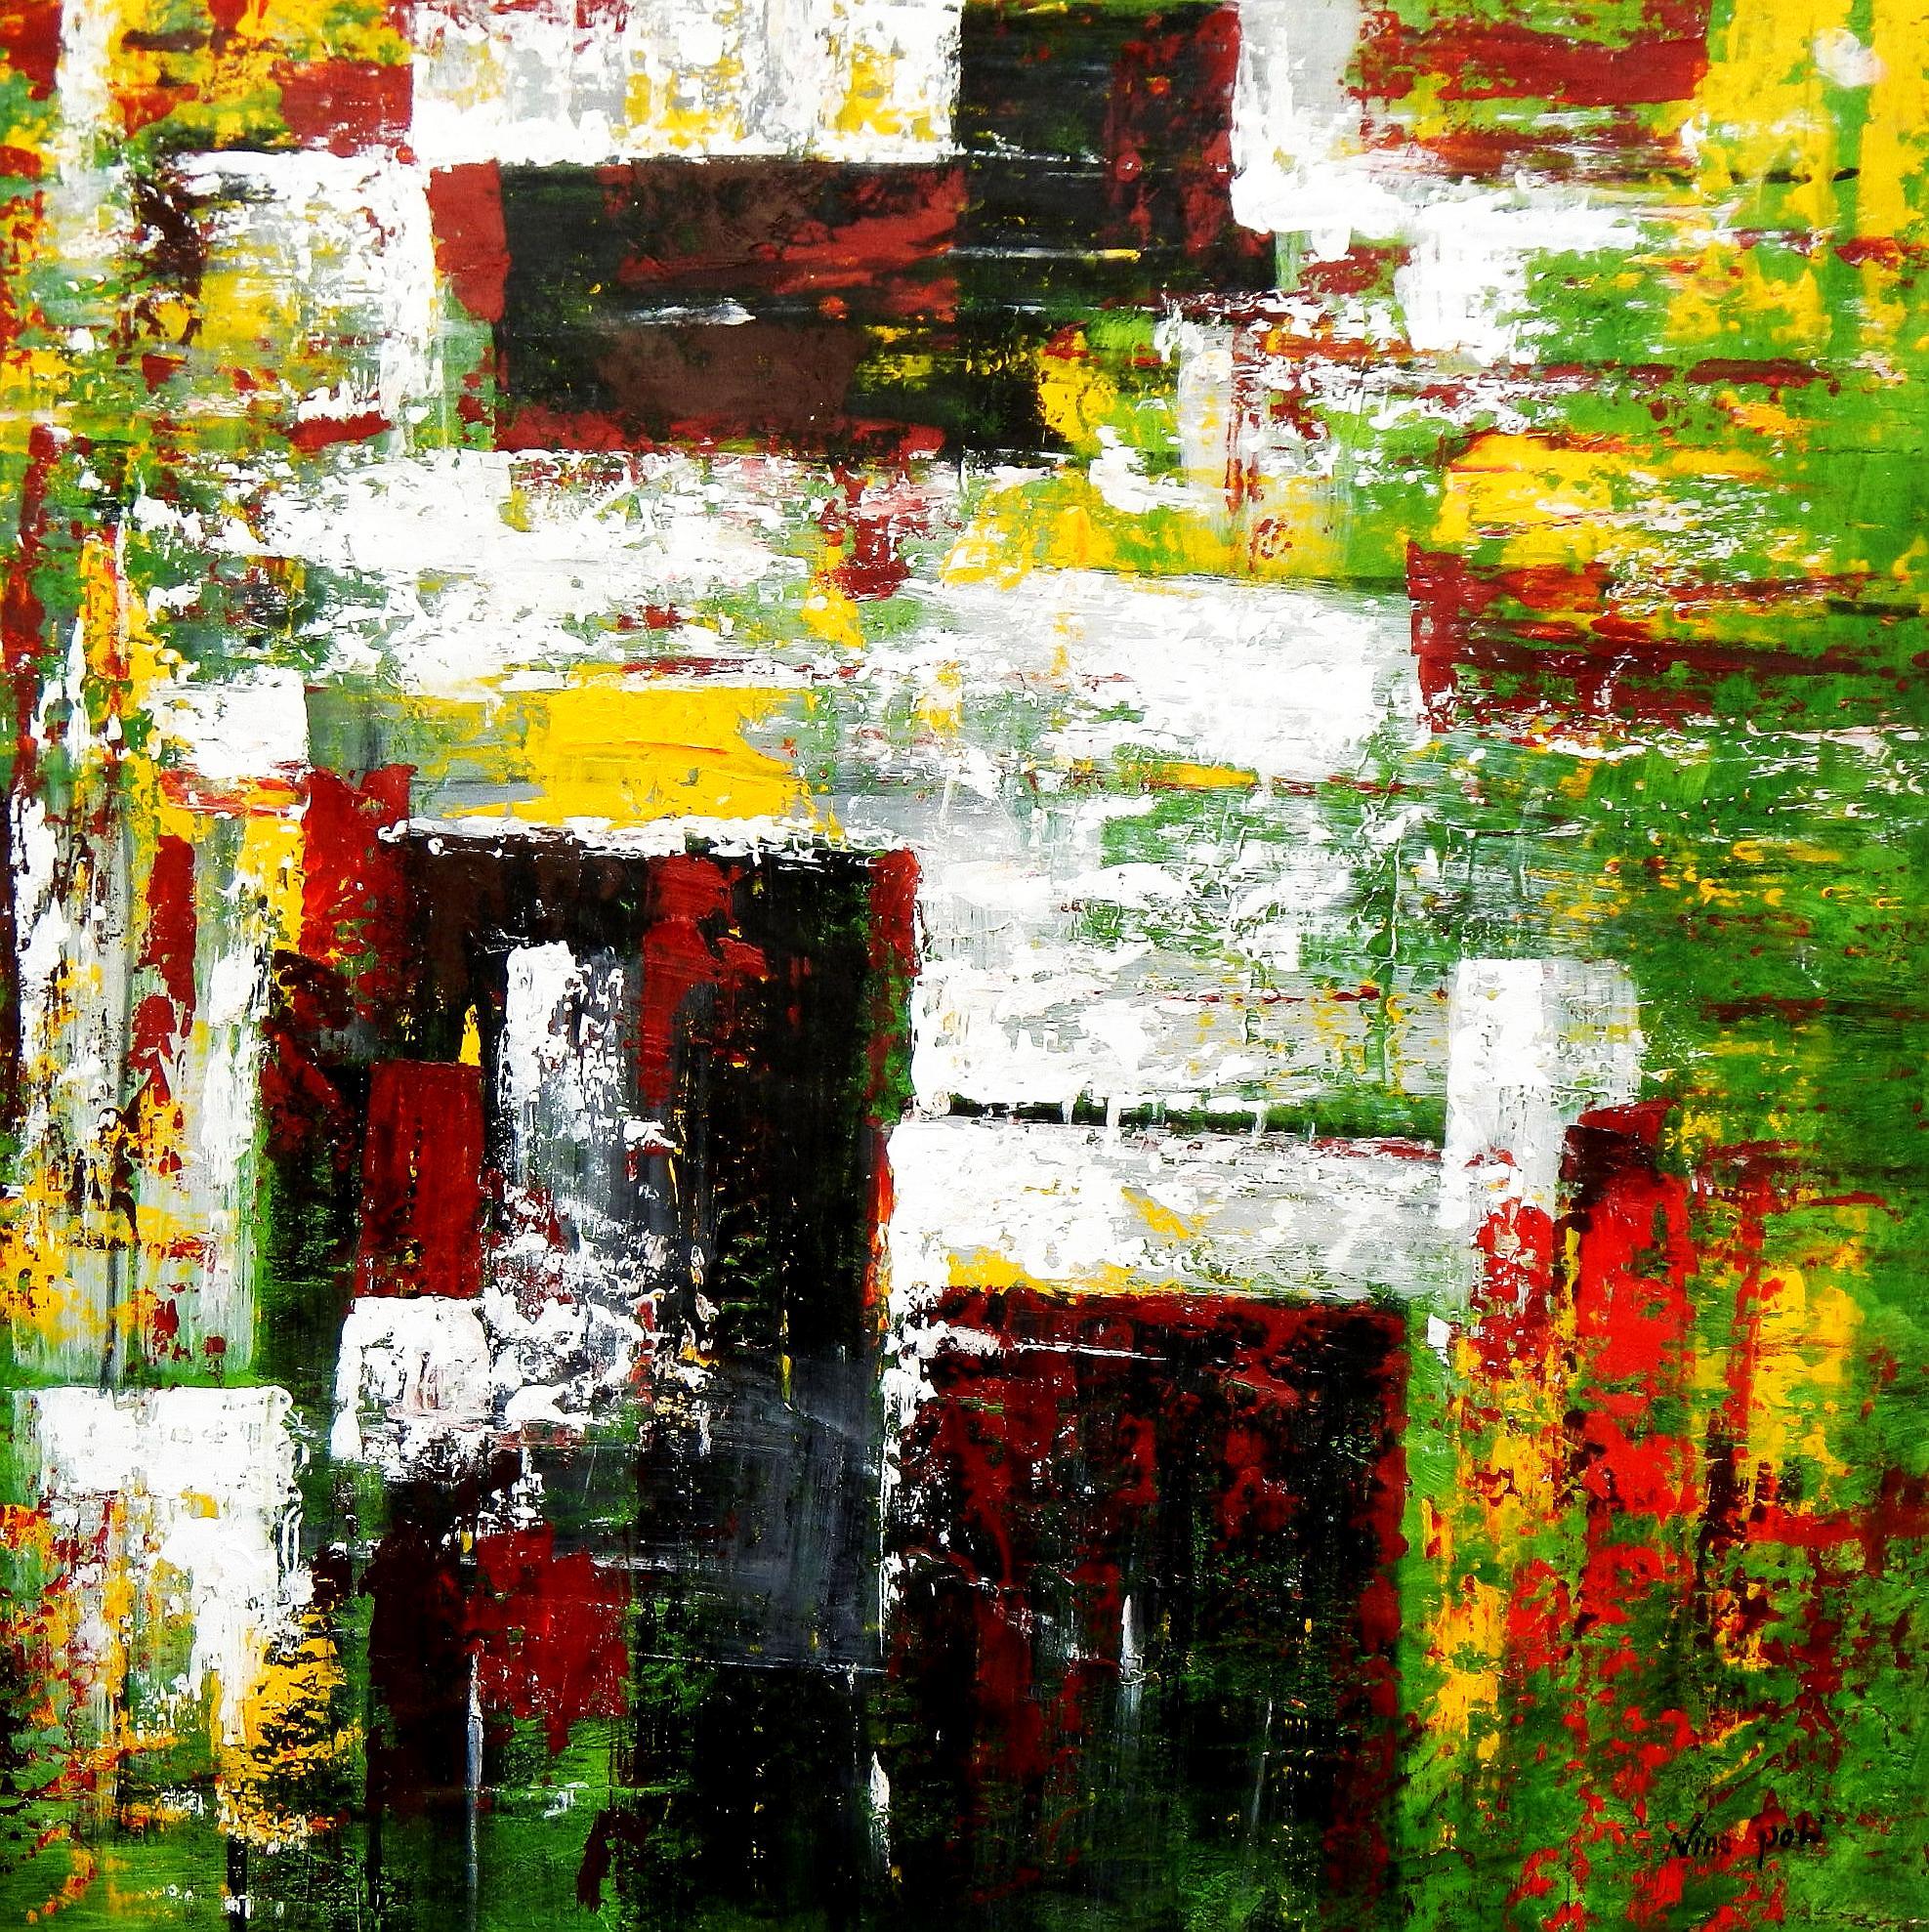 Abstrakt - Berlin Tiergarten m94724 120x120cm abstraktes Ölbild handgemalt